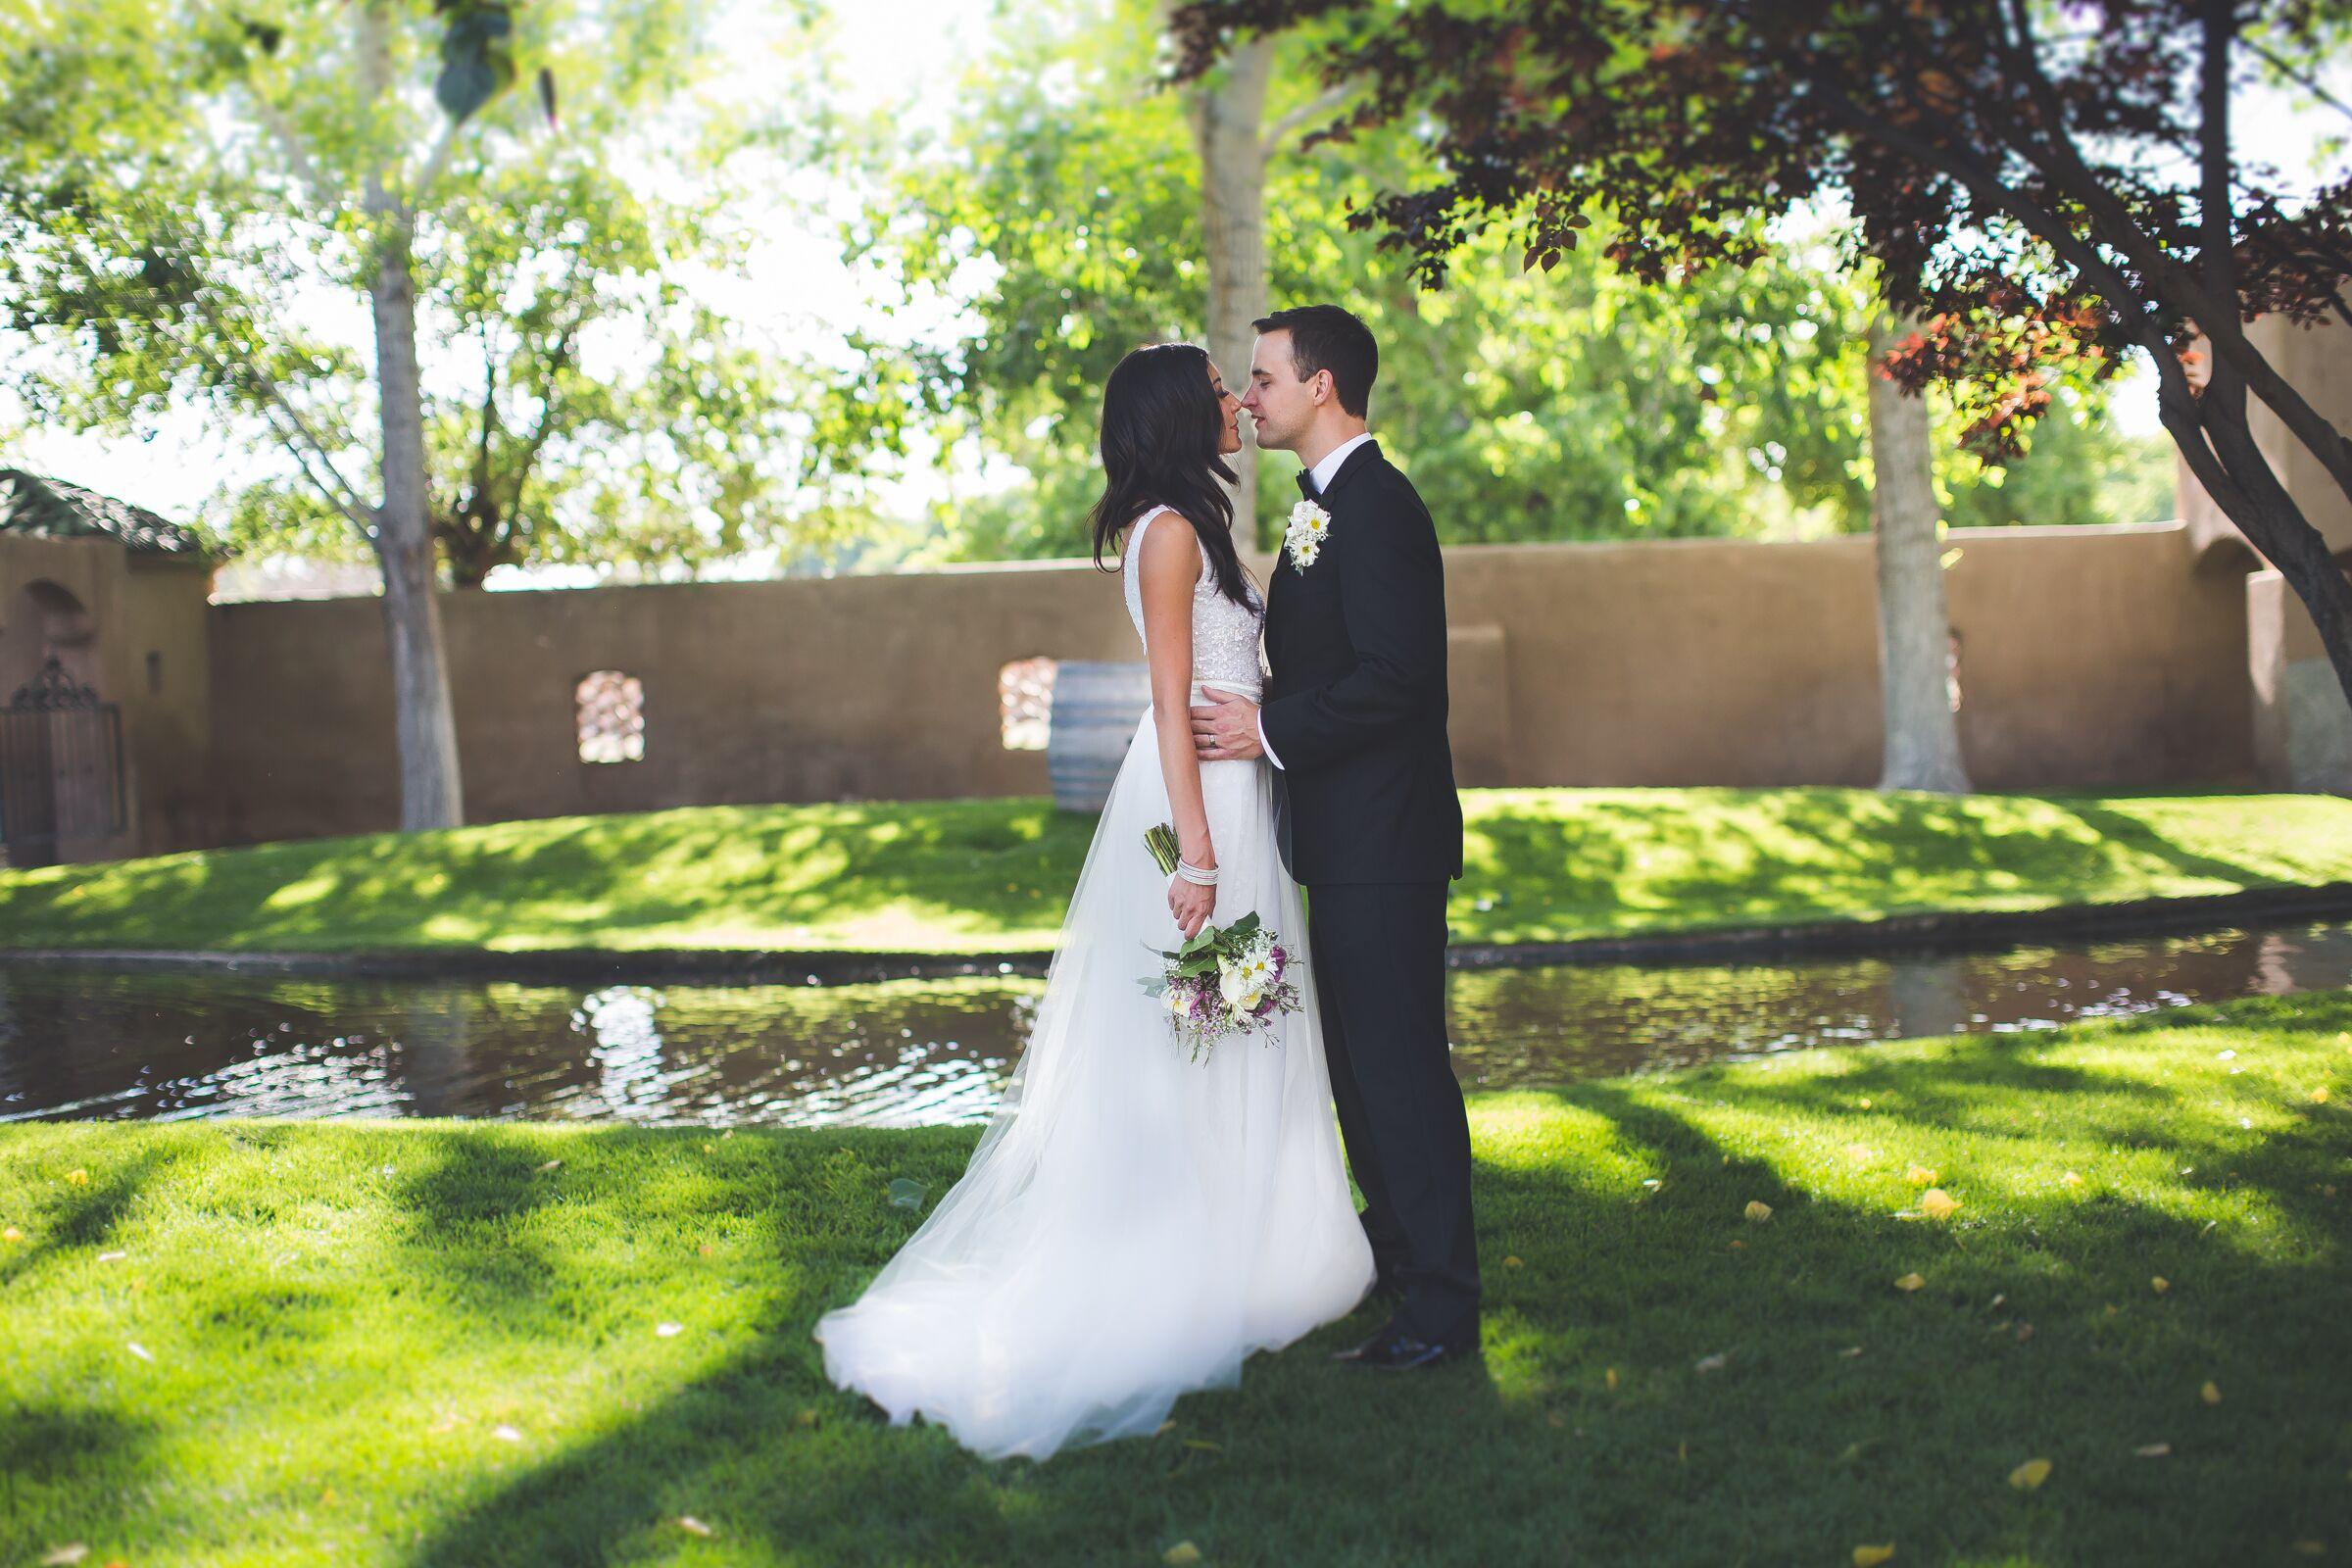 Wedding Invitations Albuquerque: A Glam, Old Hollywood-Inspired Wedding At Casa Rondena